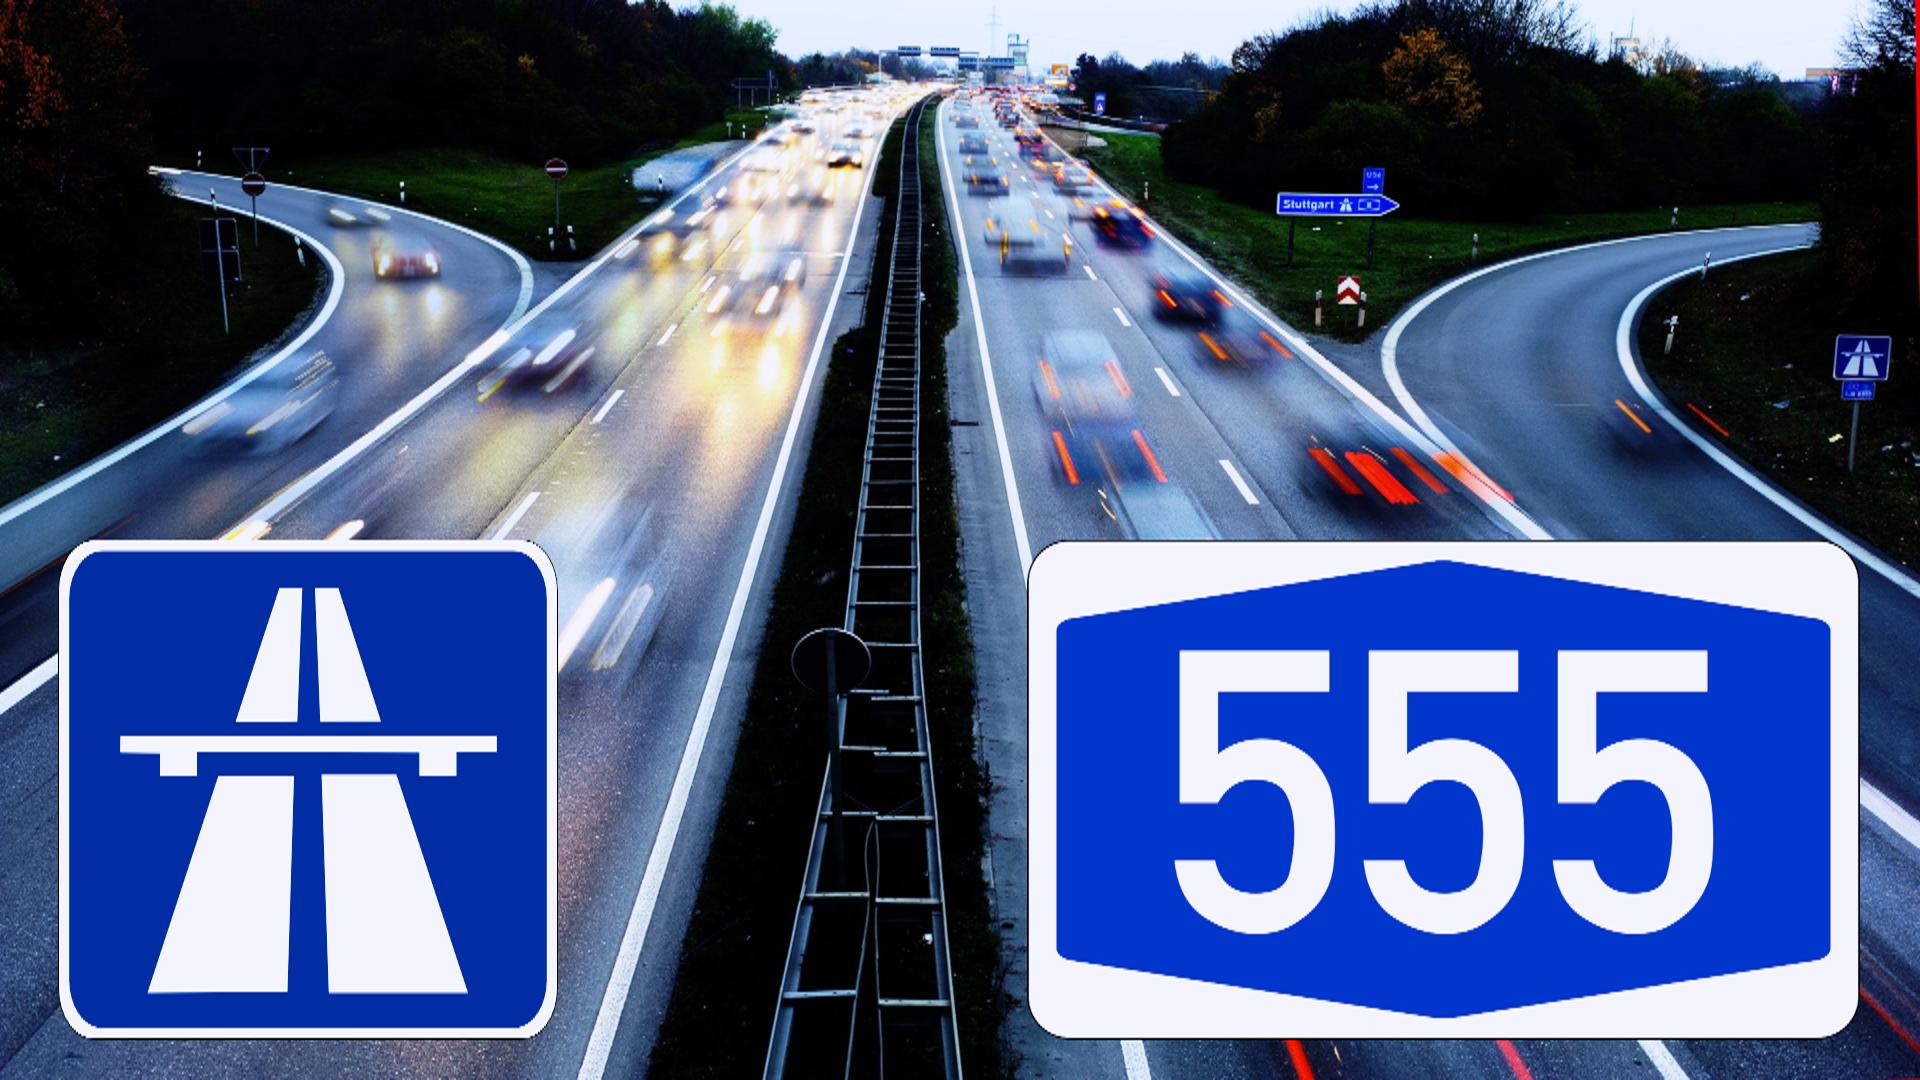 FEATURE-Reichsautobahn-555-comemoration